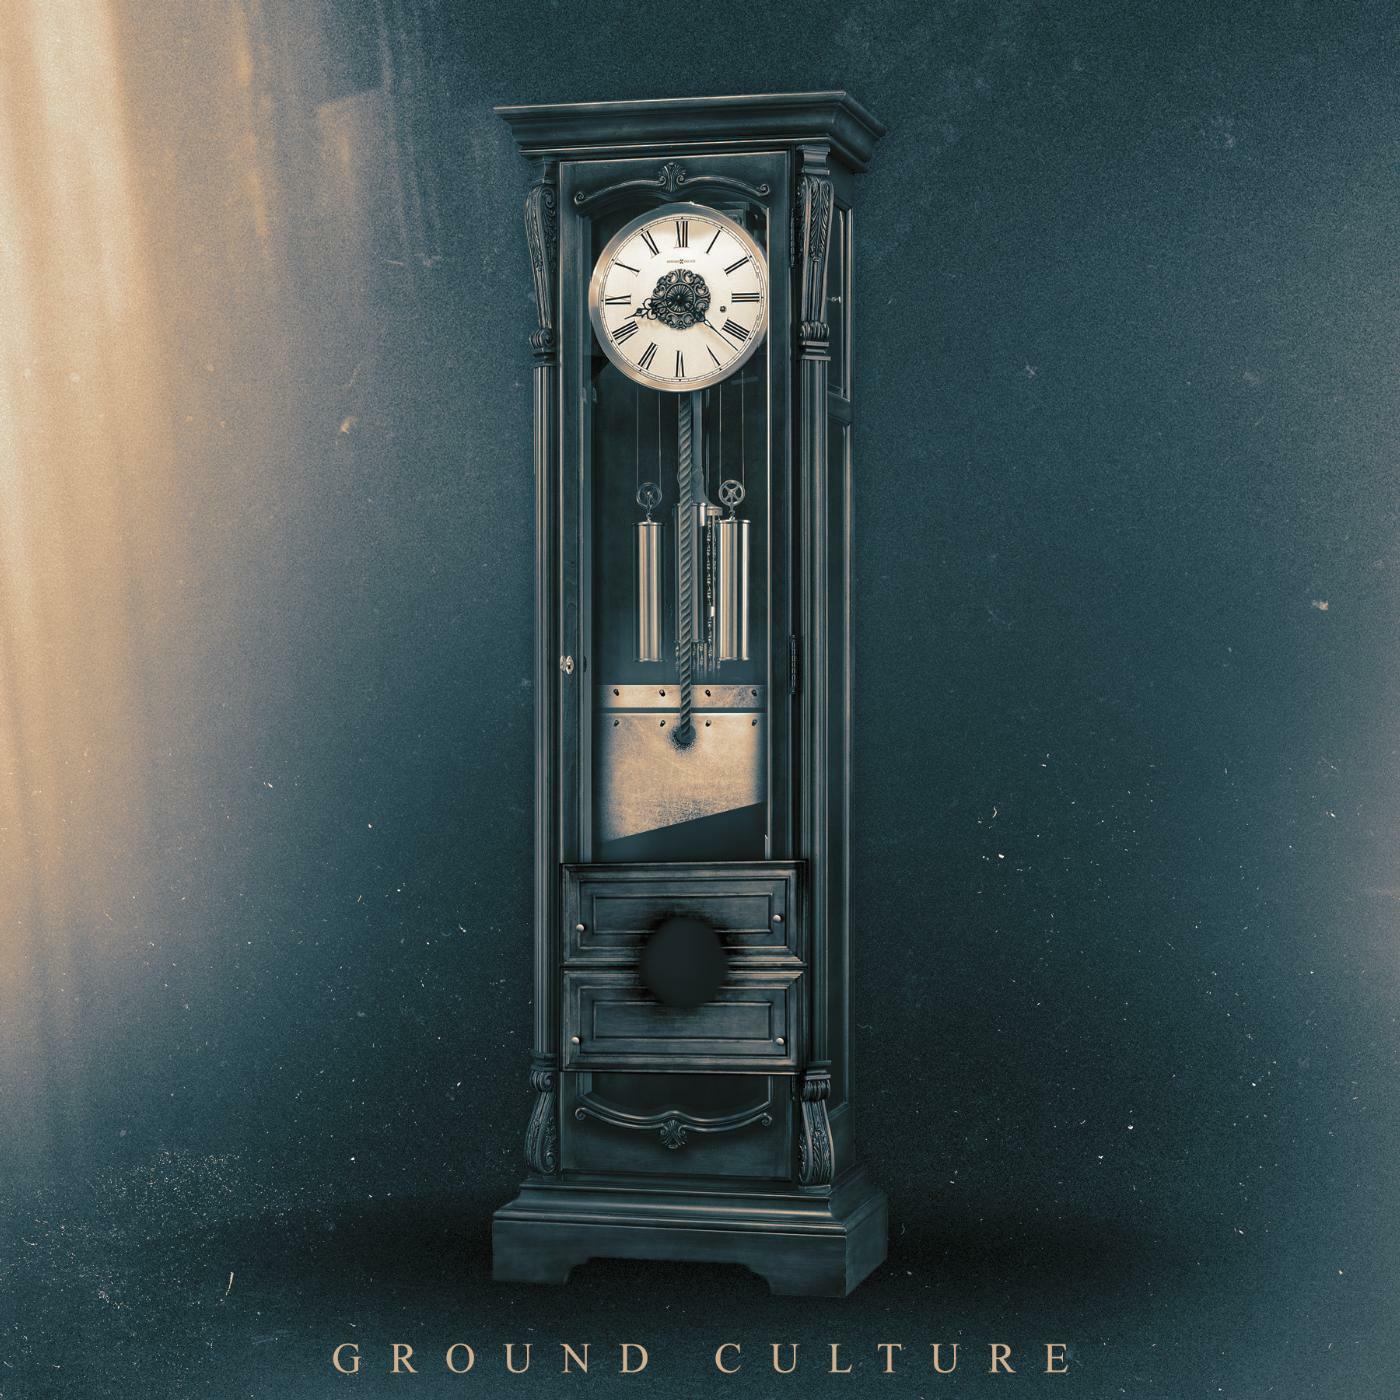 Kingdom Of Giants - Ground Culture (2014)